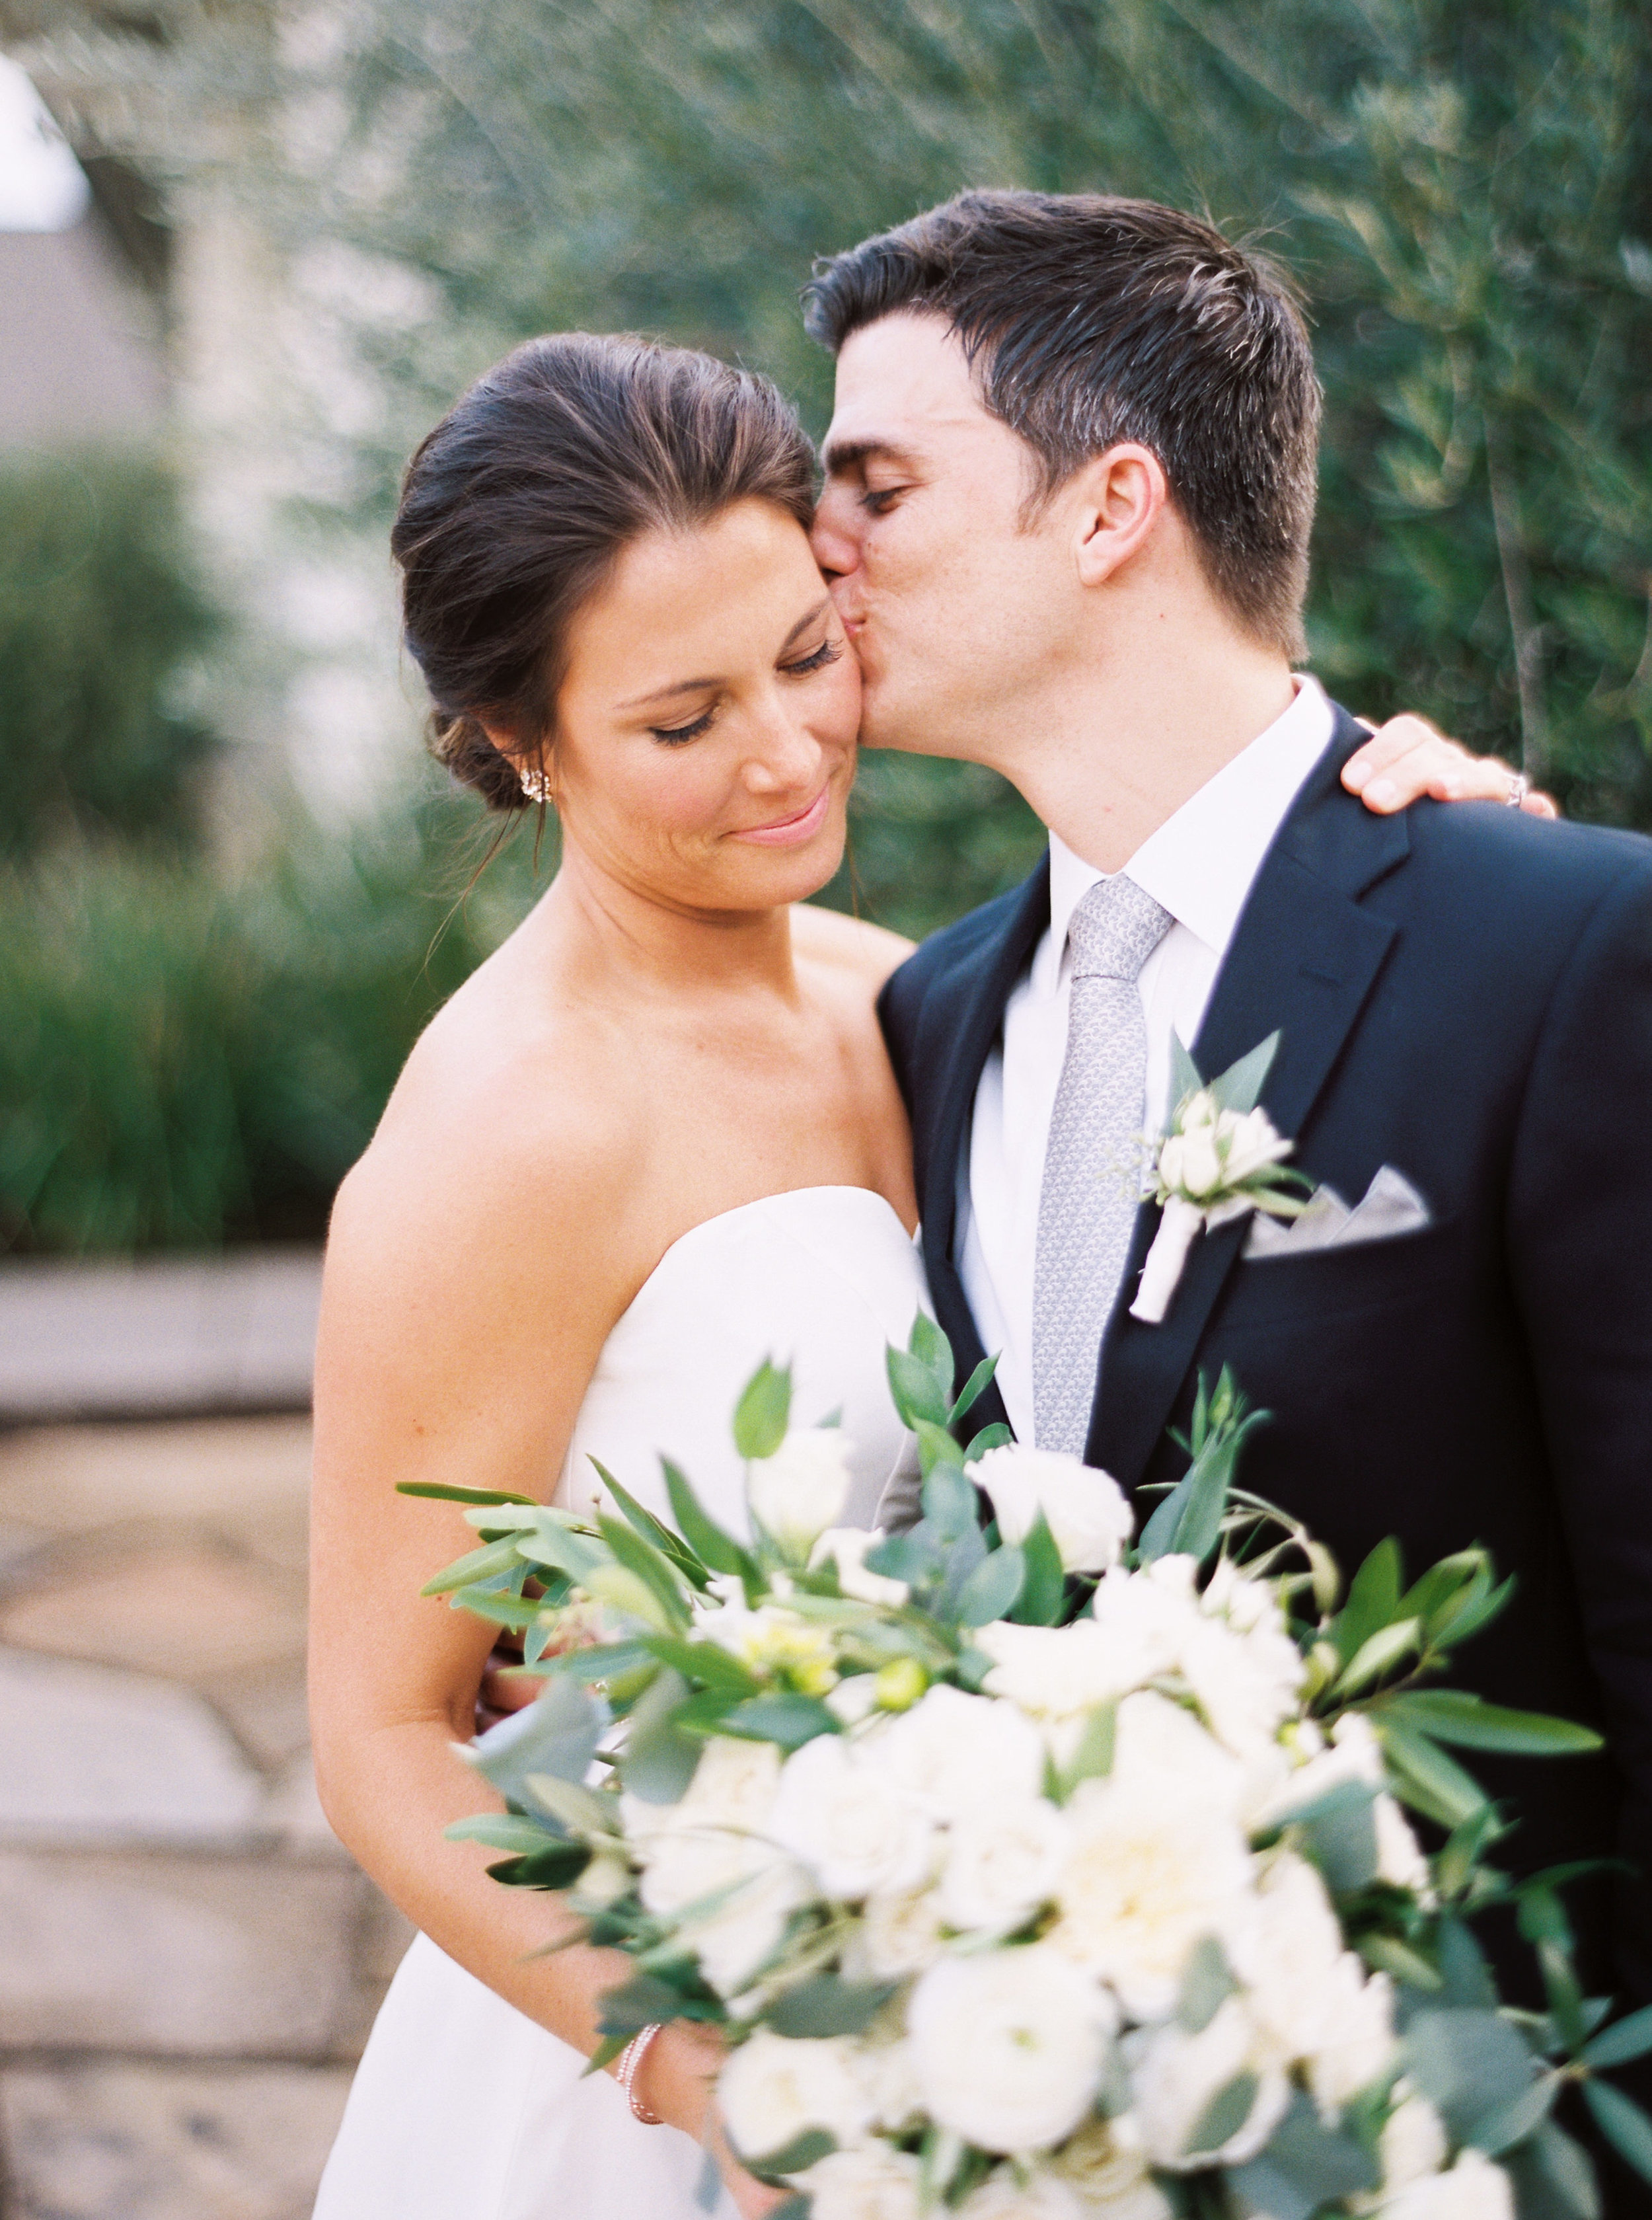 intimate-wedding-at-solage-calistoga-in-napa-173.jpg